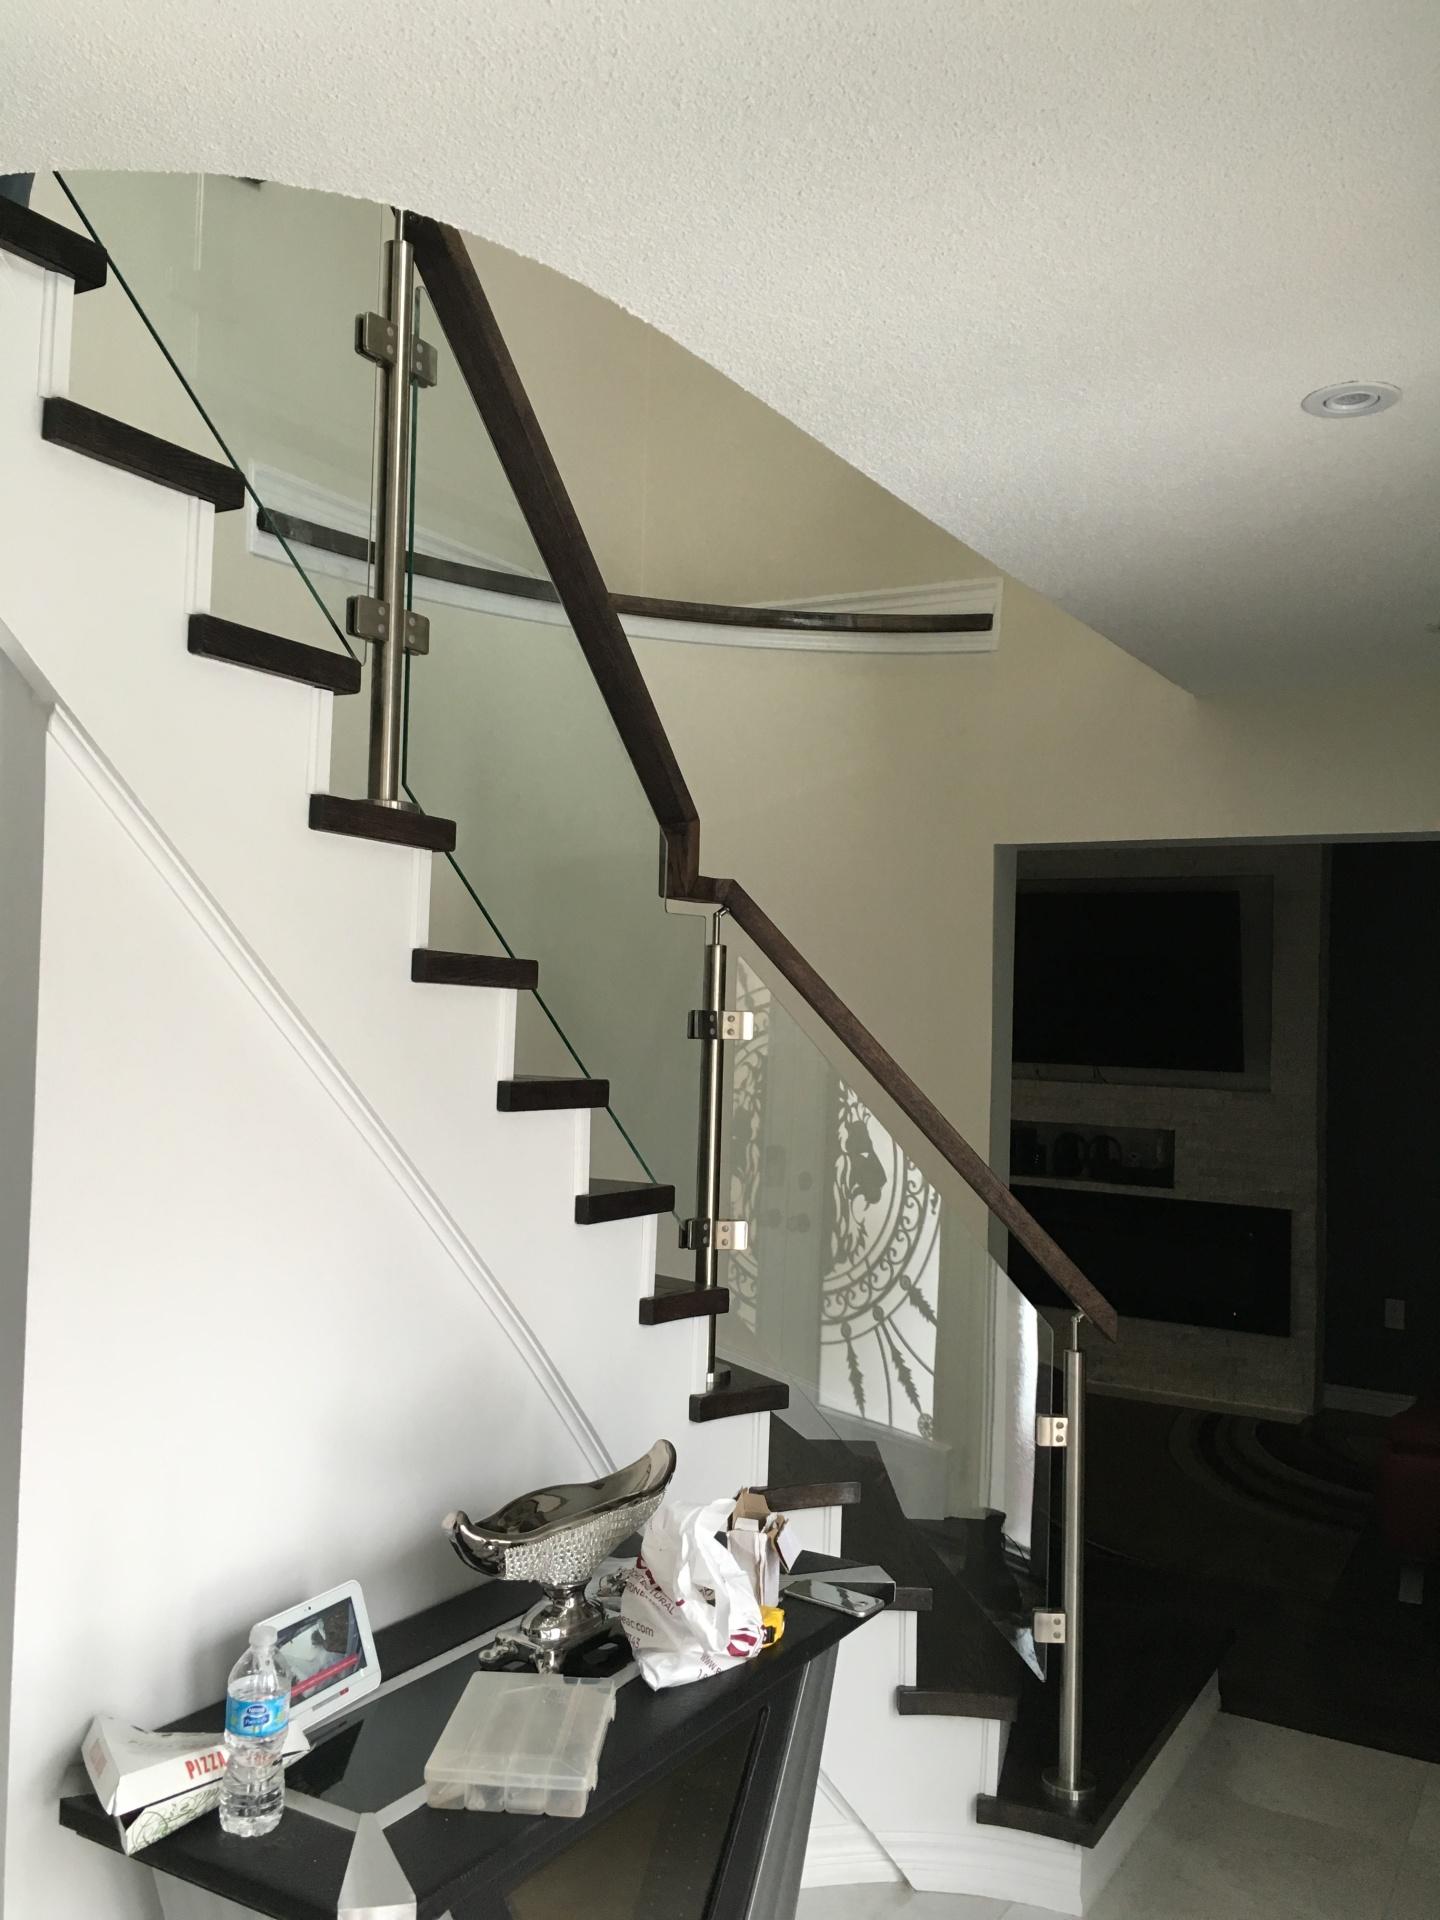 Full post glass railings